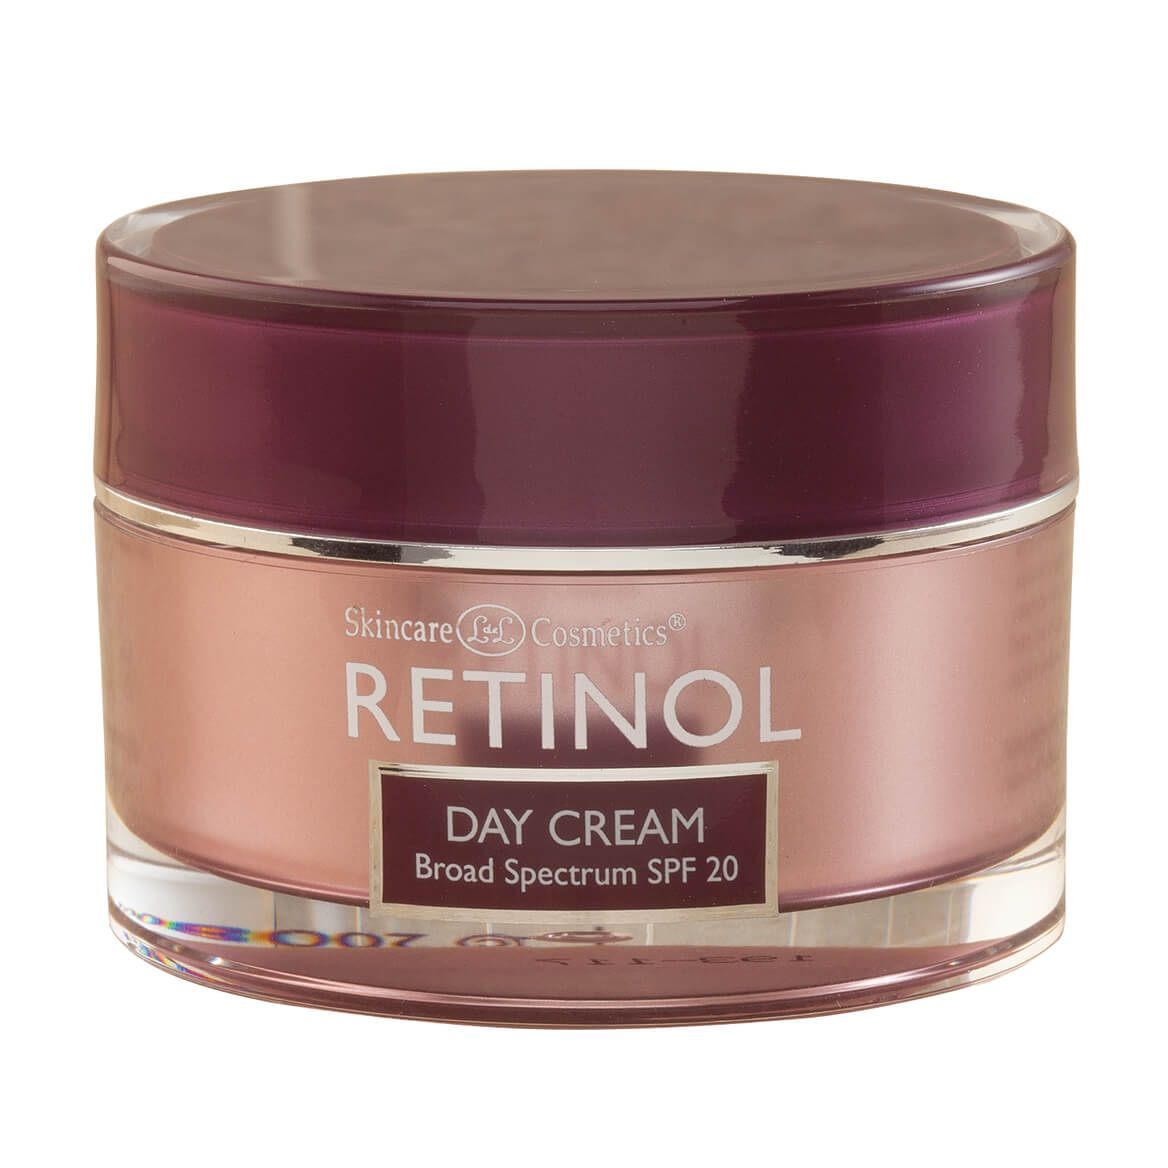 Skincare Cosmetics Retinol Day Cream-306379